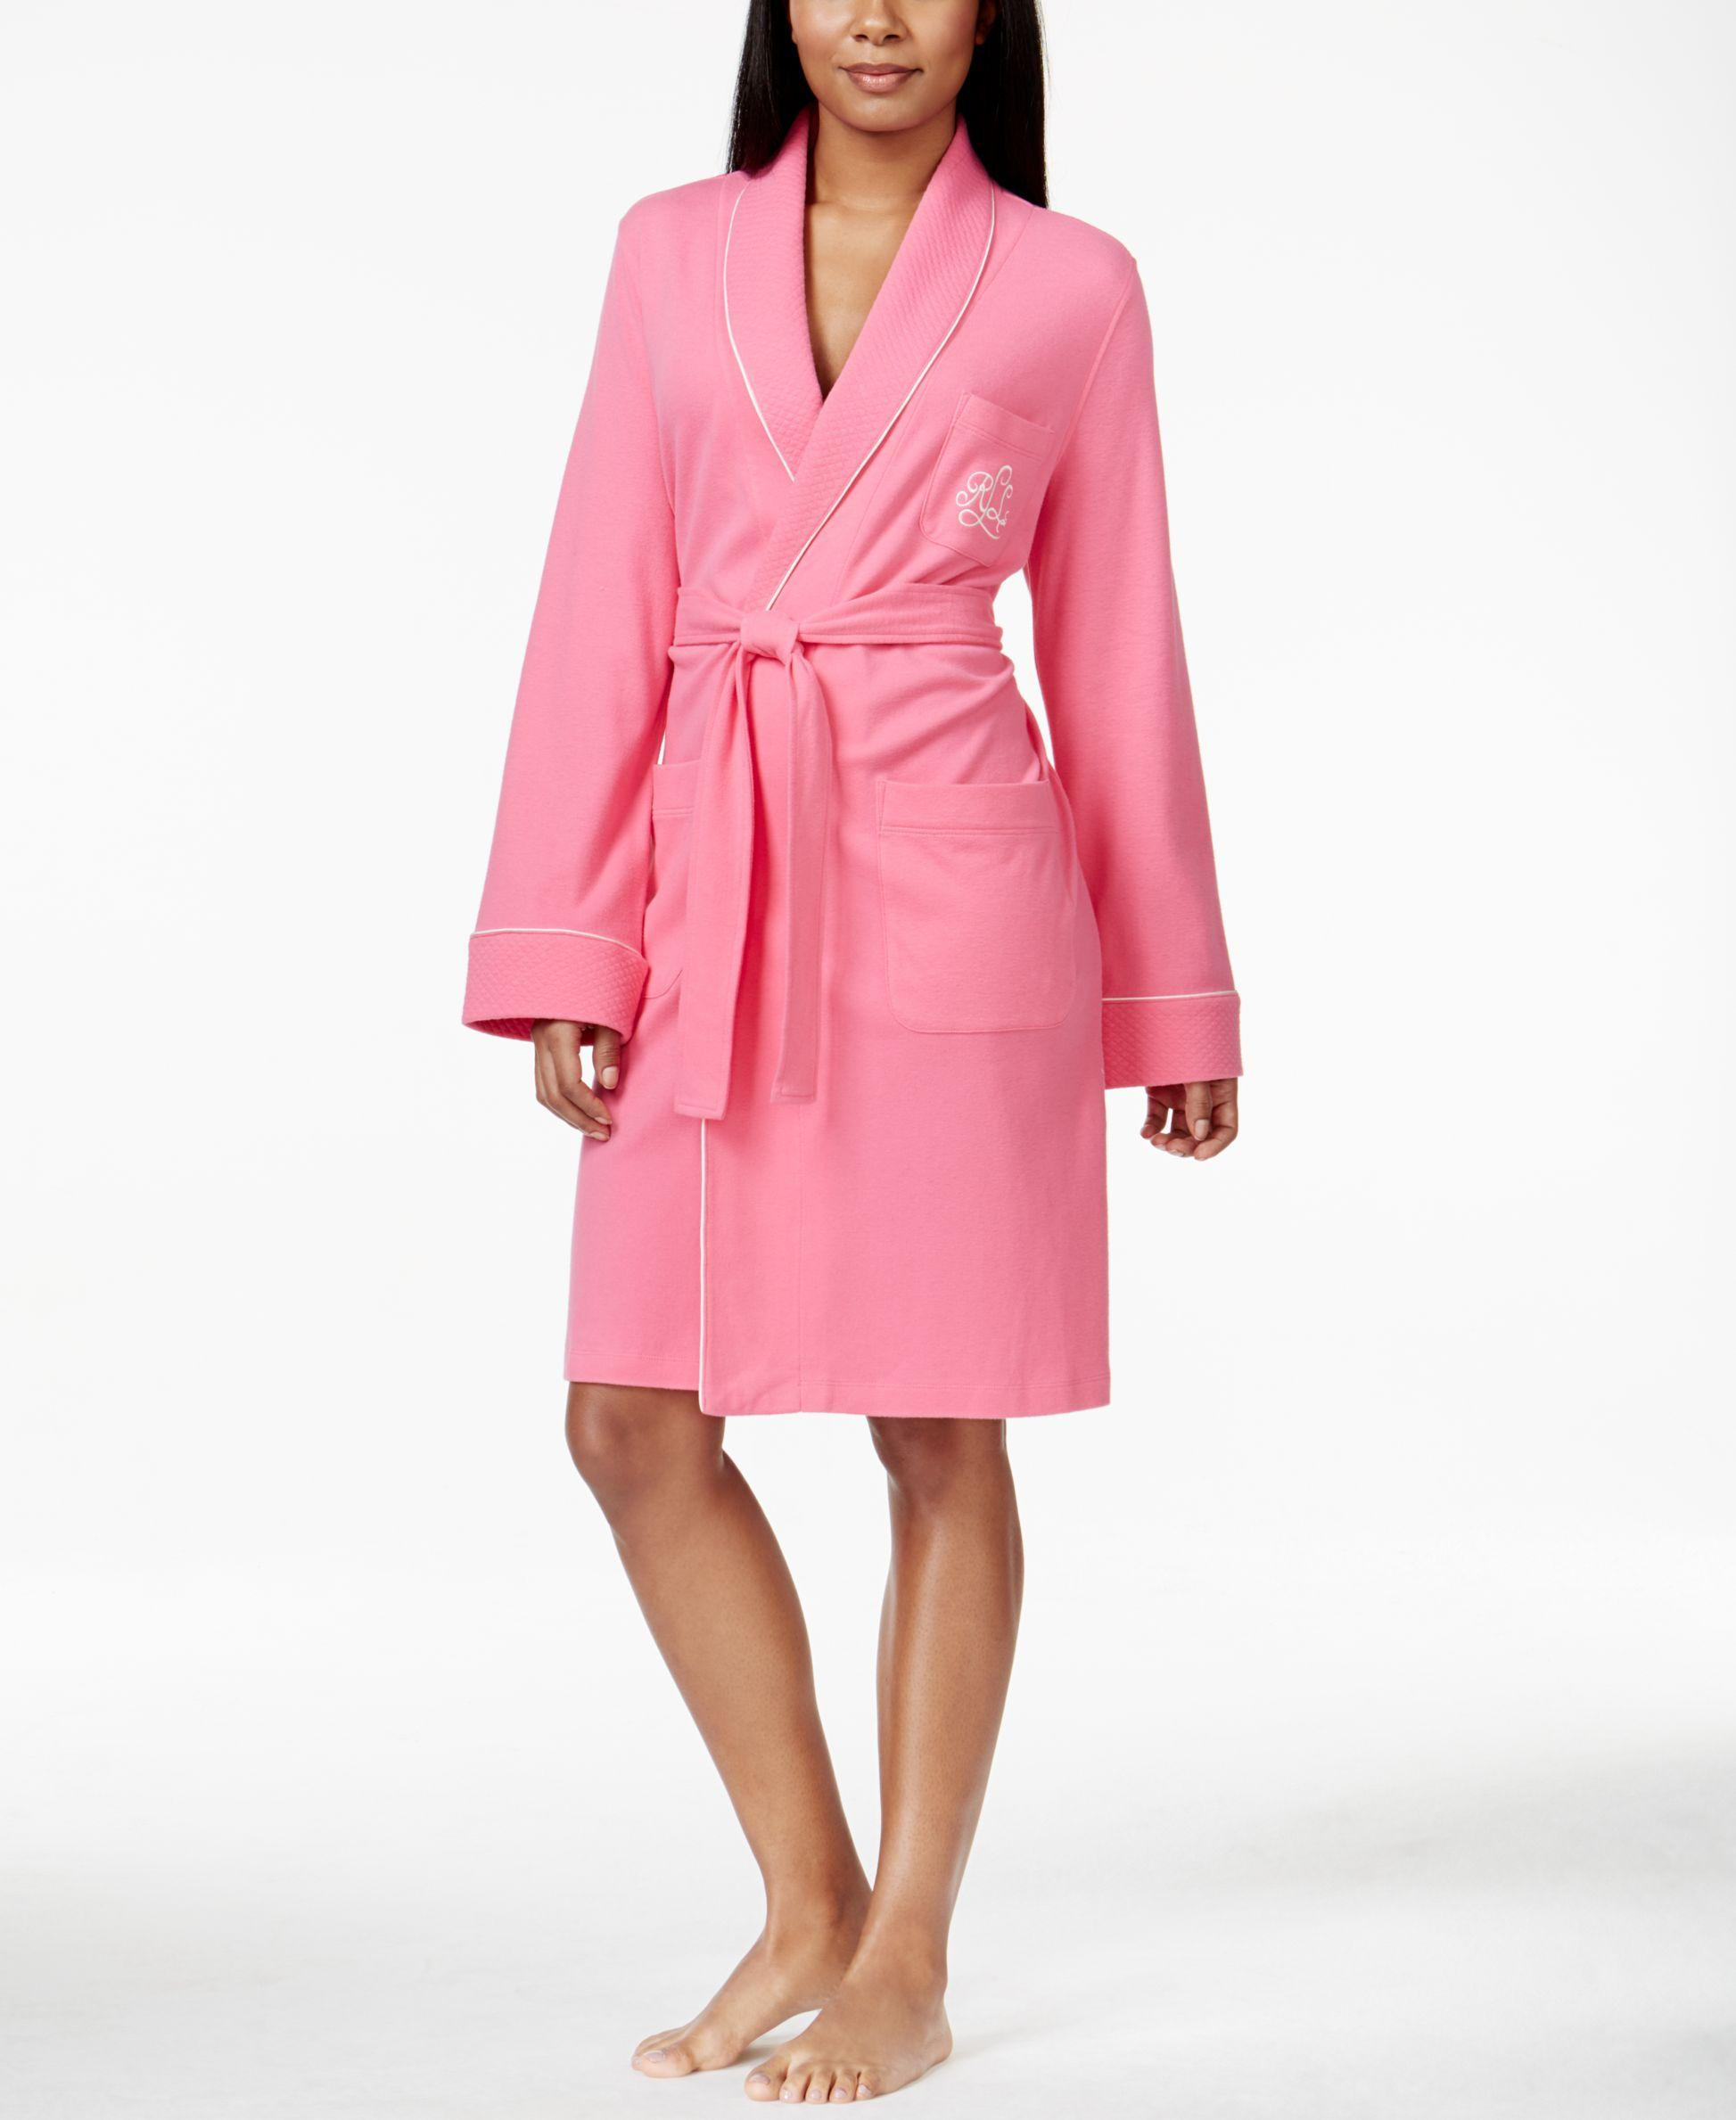 Lauren by ralph lauren Quilted Shawl Collar Short Robe in ...